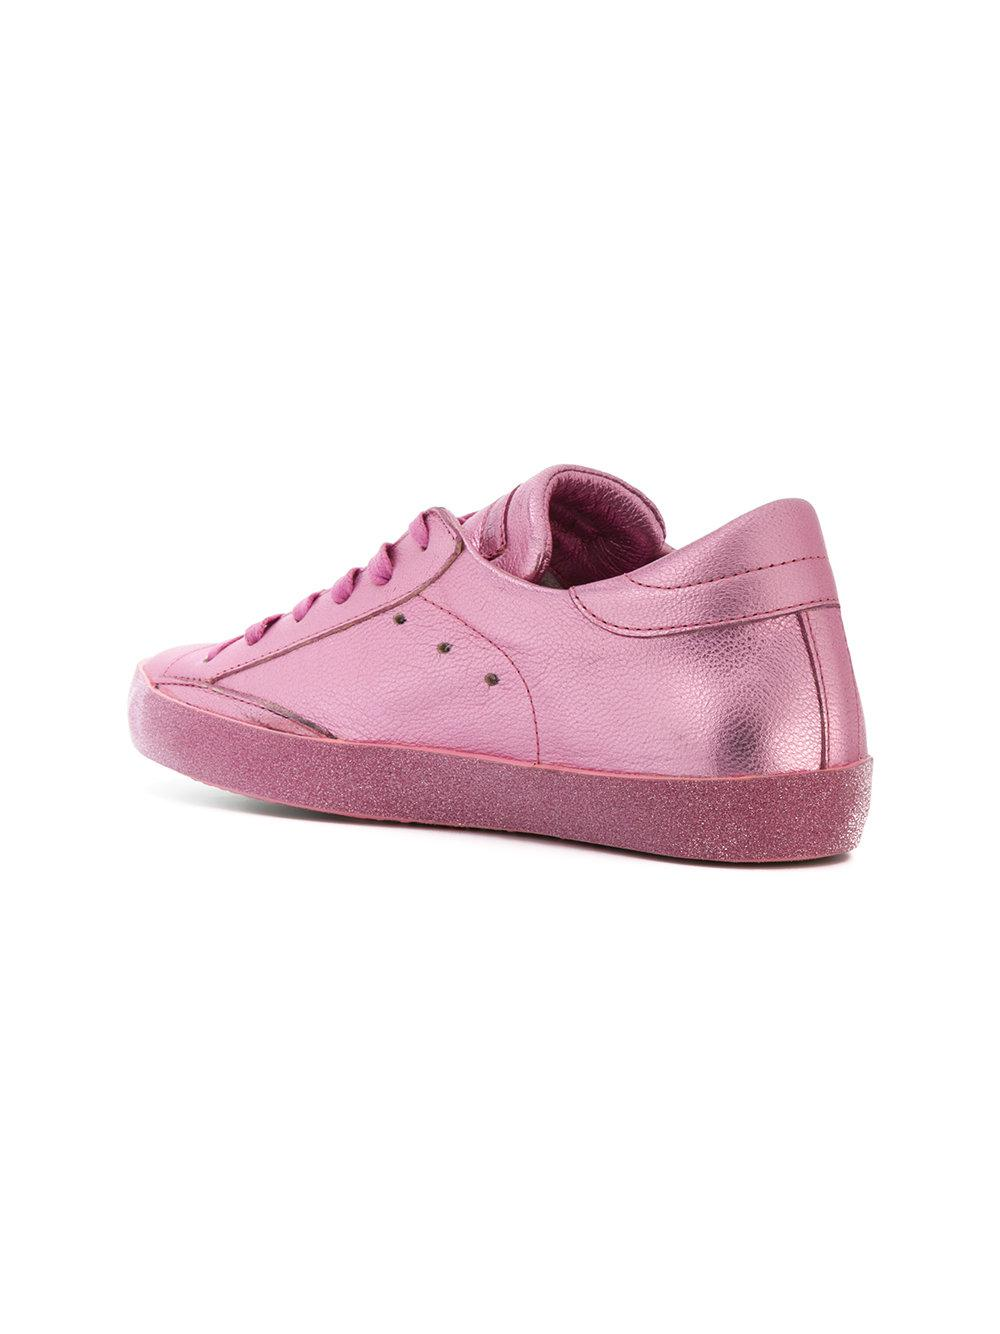 Paris sneakers - Pink & Purple Philippe Model T10qX